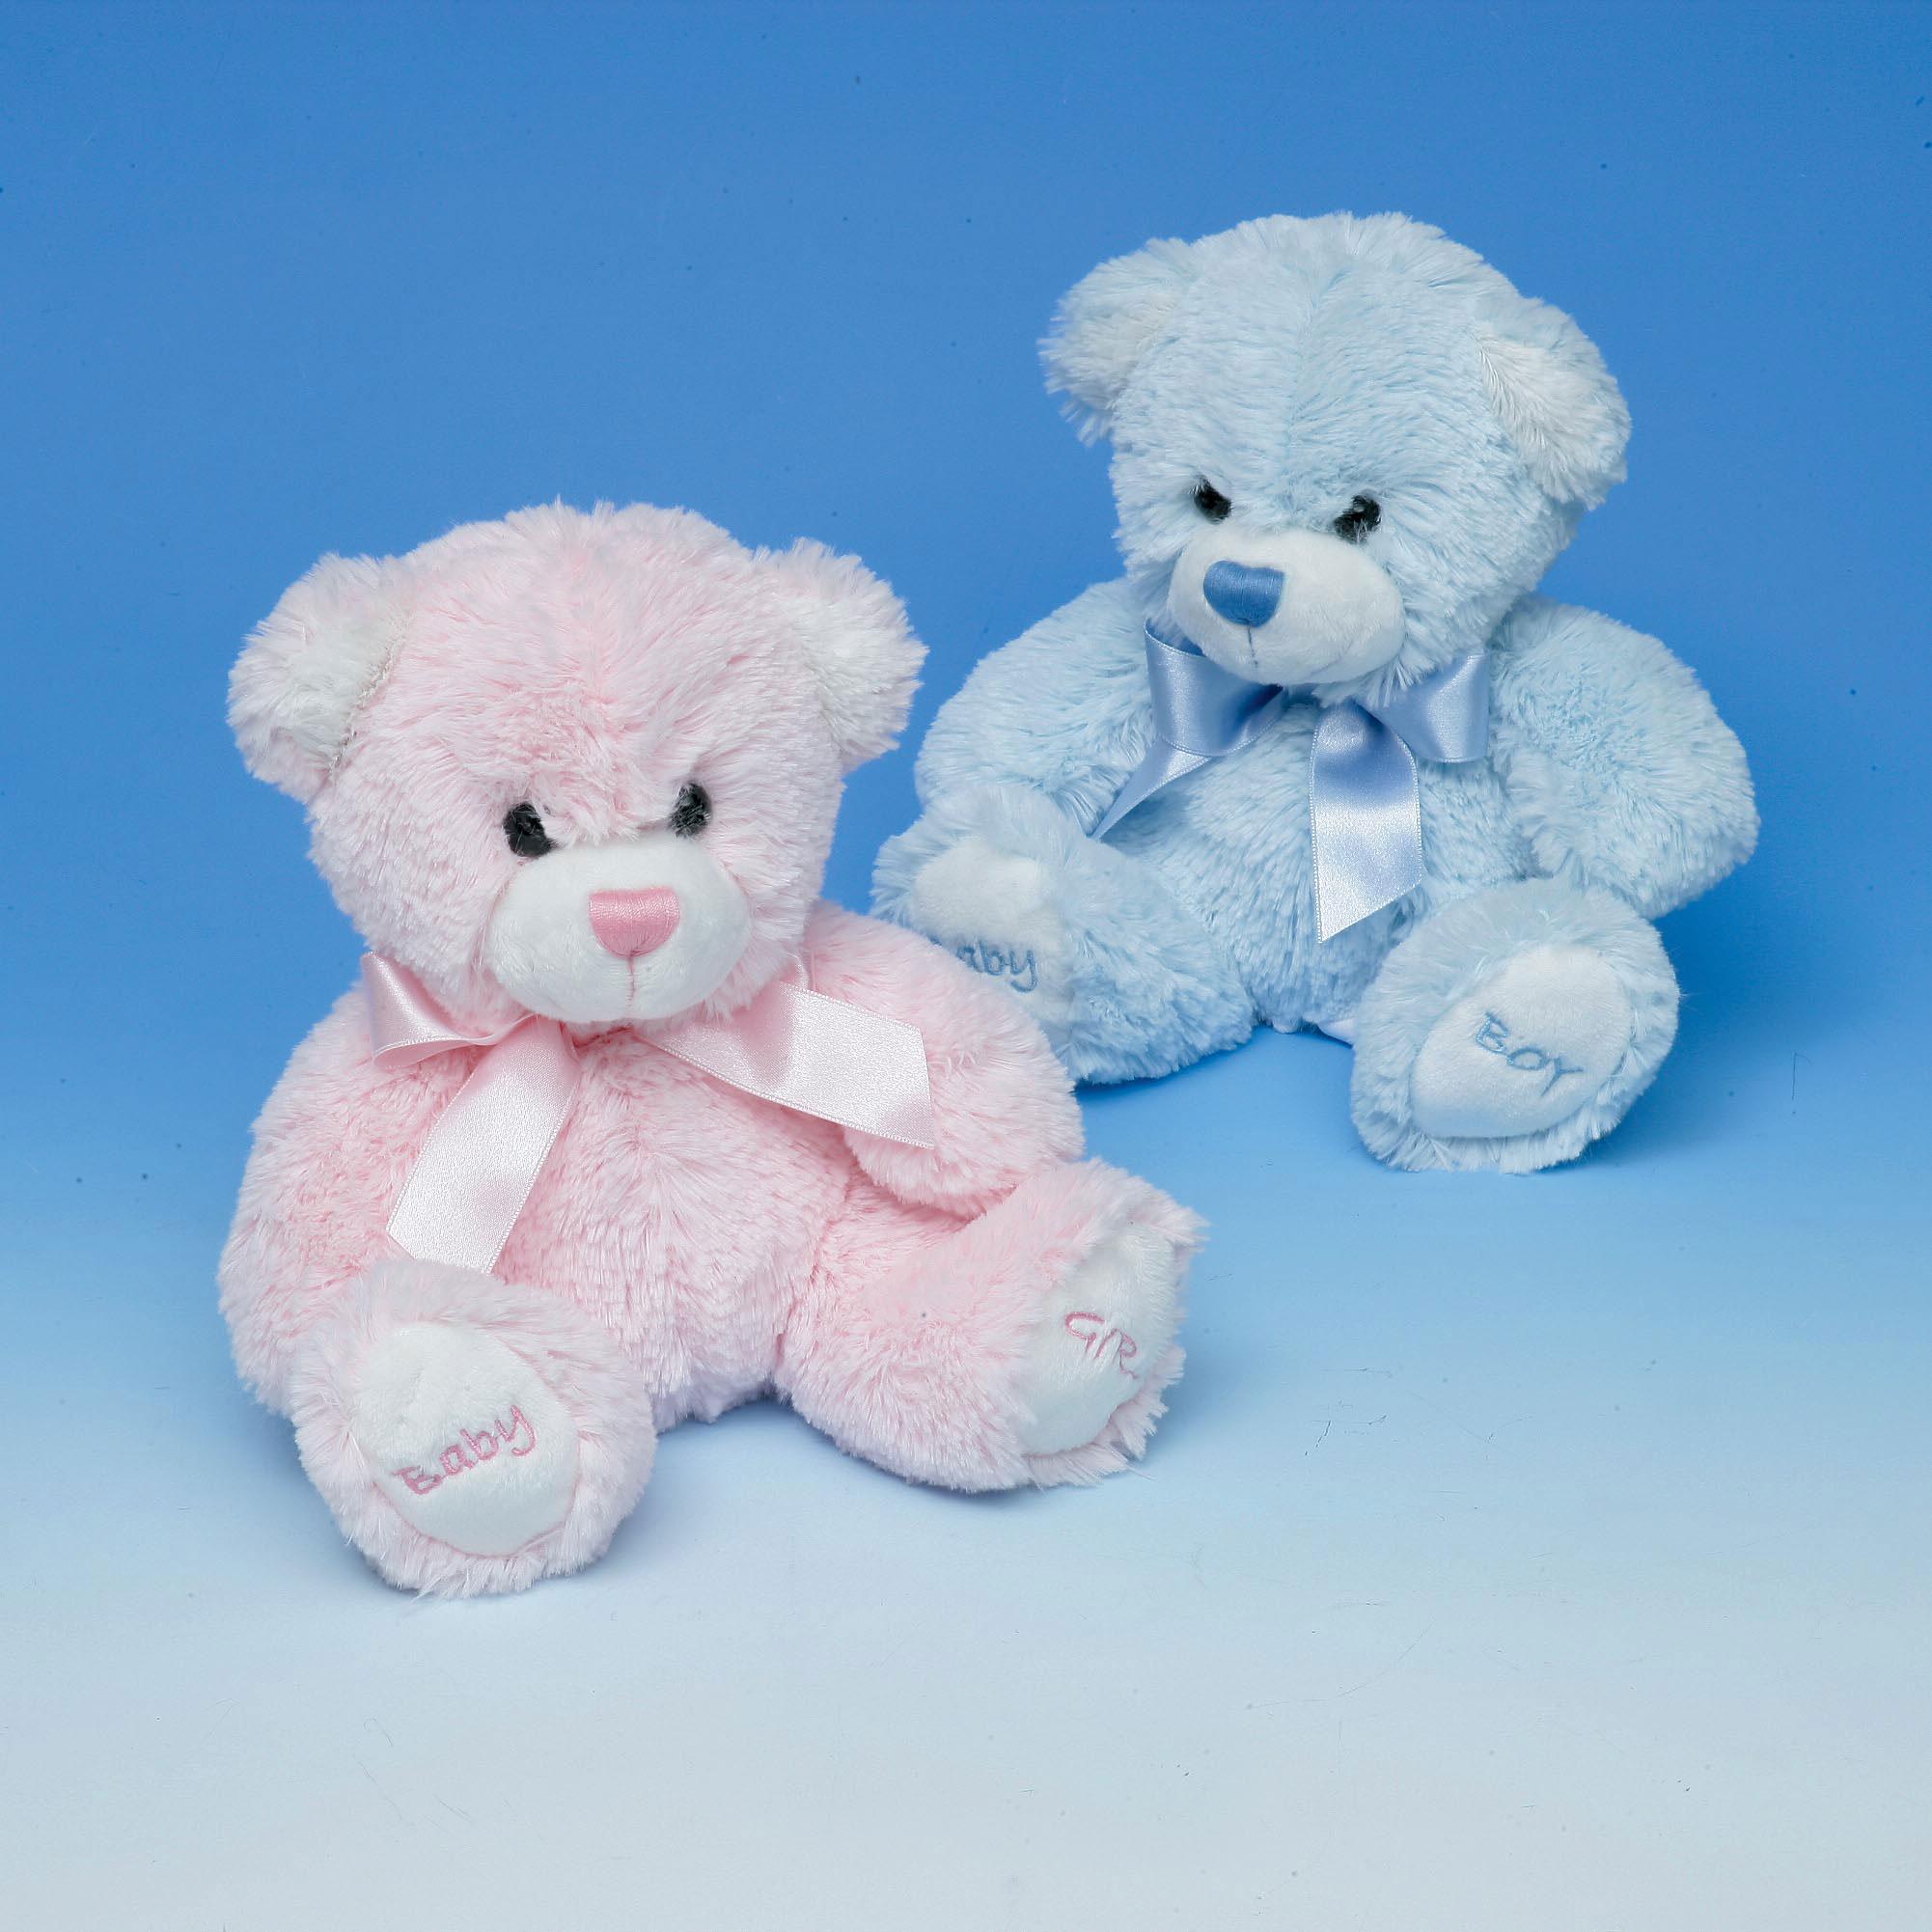 18cm BLUE Baby's First Teddy